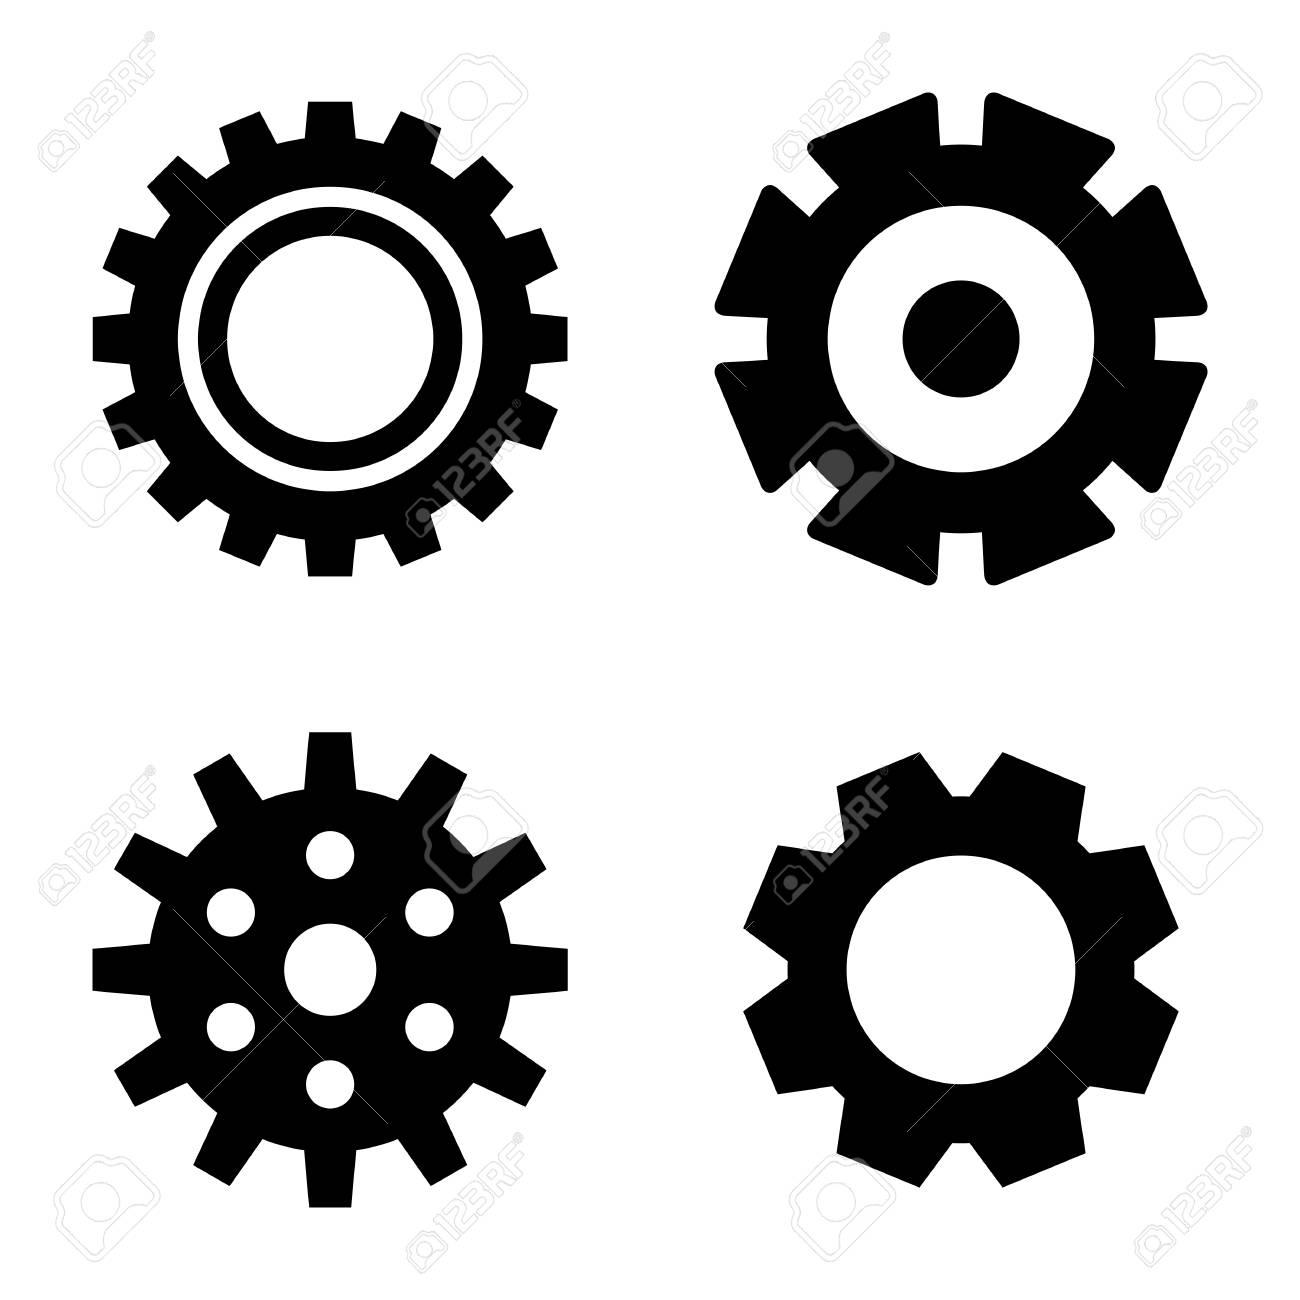 Großartig Einfaches Motorschema Ideen - Schaltplan Serie Circuit ...